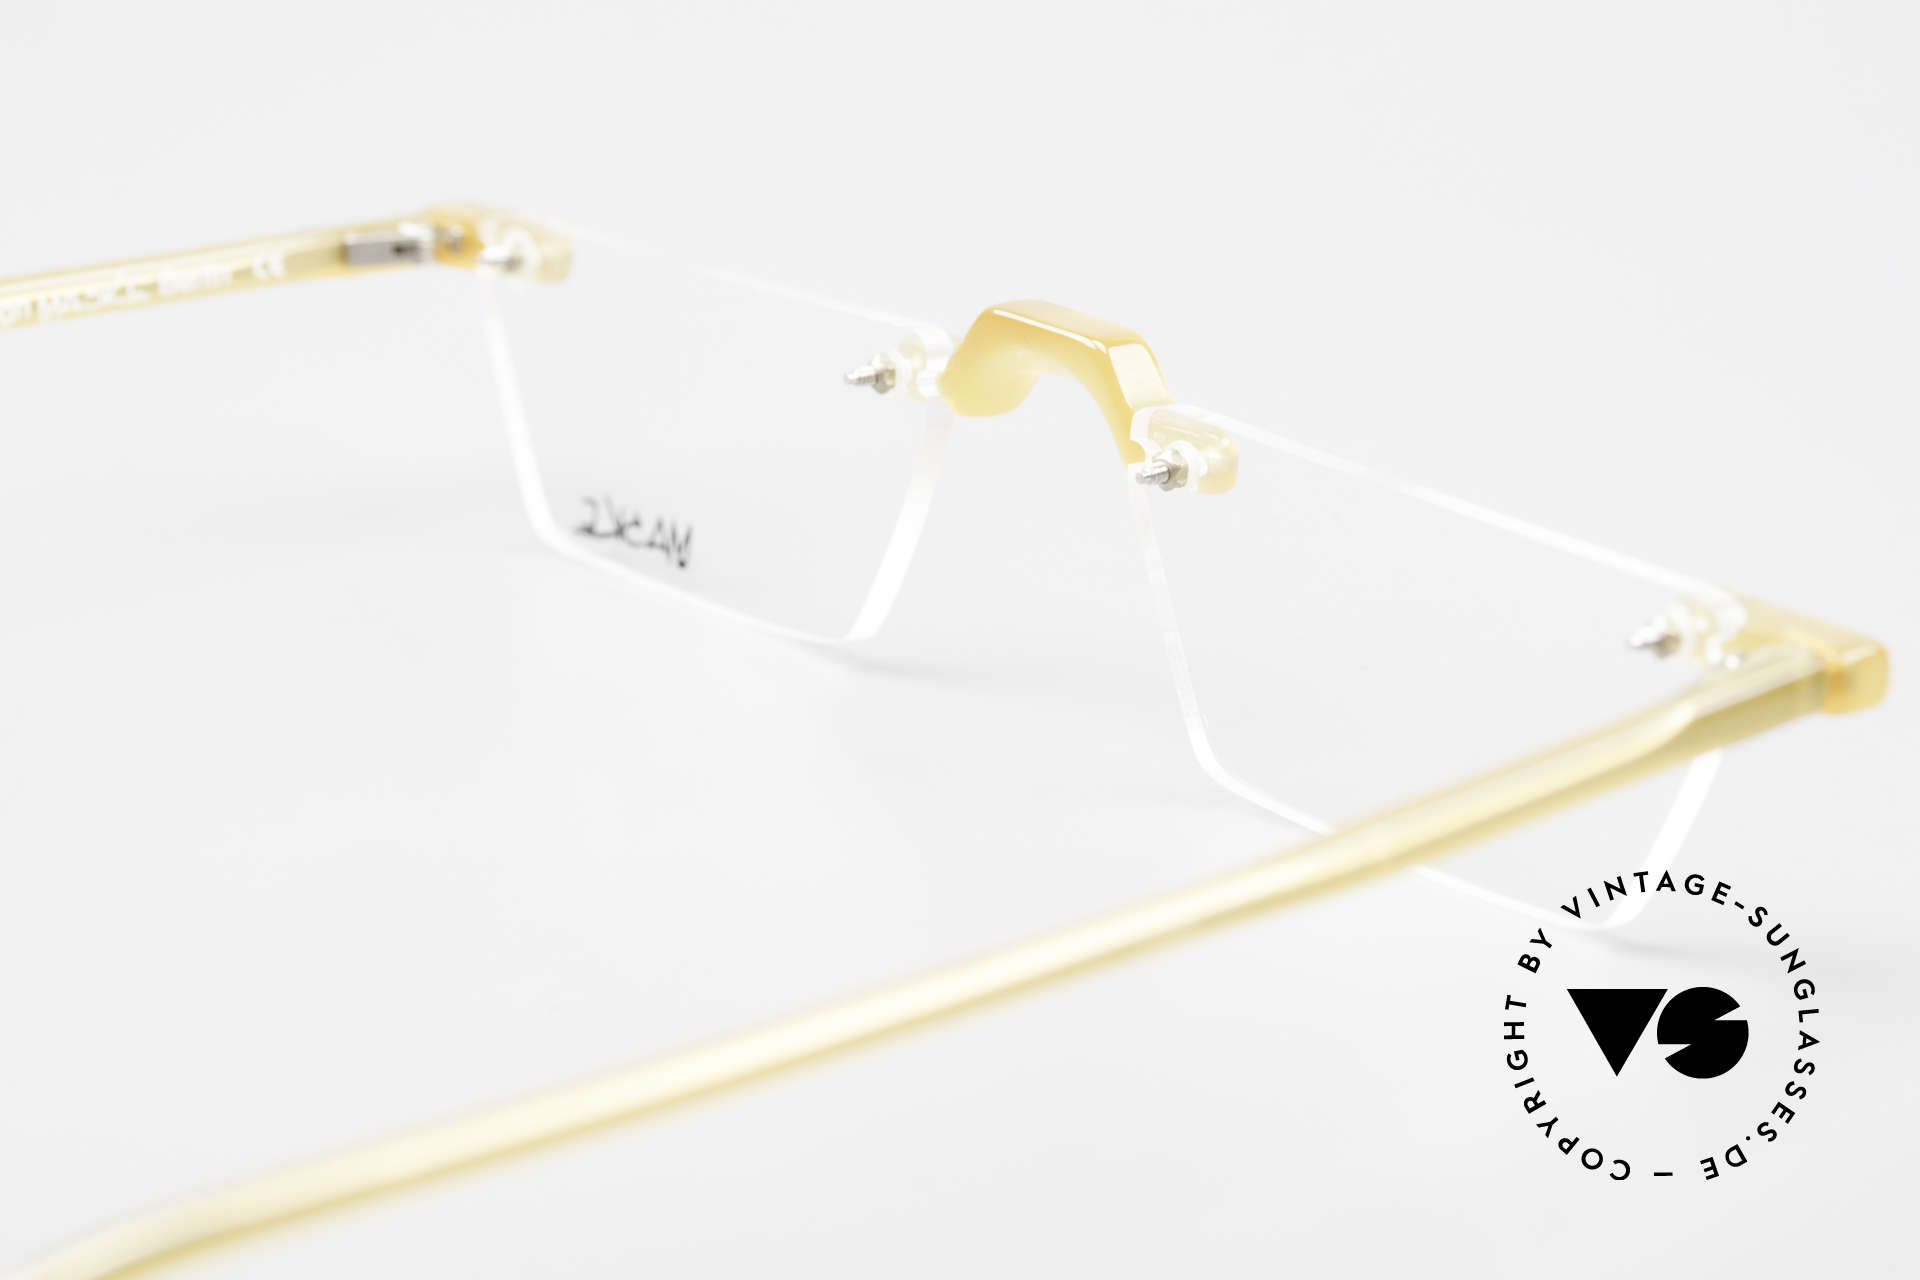 Design Maske Berlin Alpha 8 Artful 90s Reading Eyeglasses, Size: small, Made for Men and Women